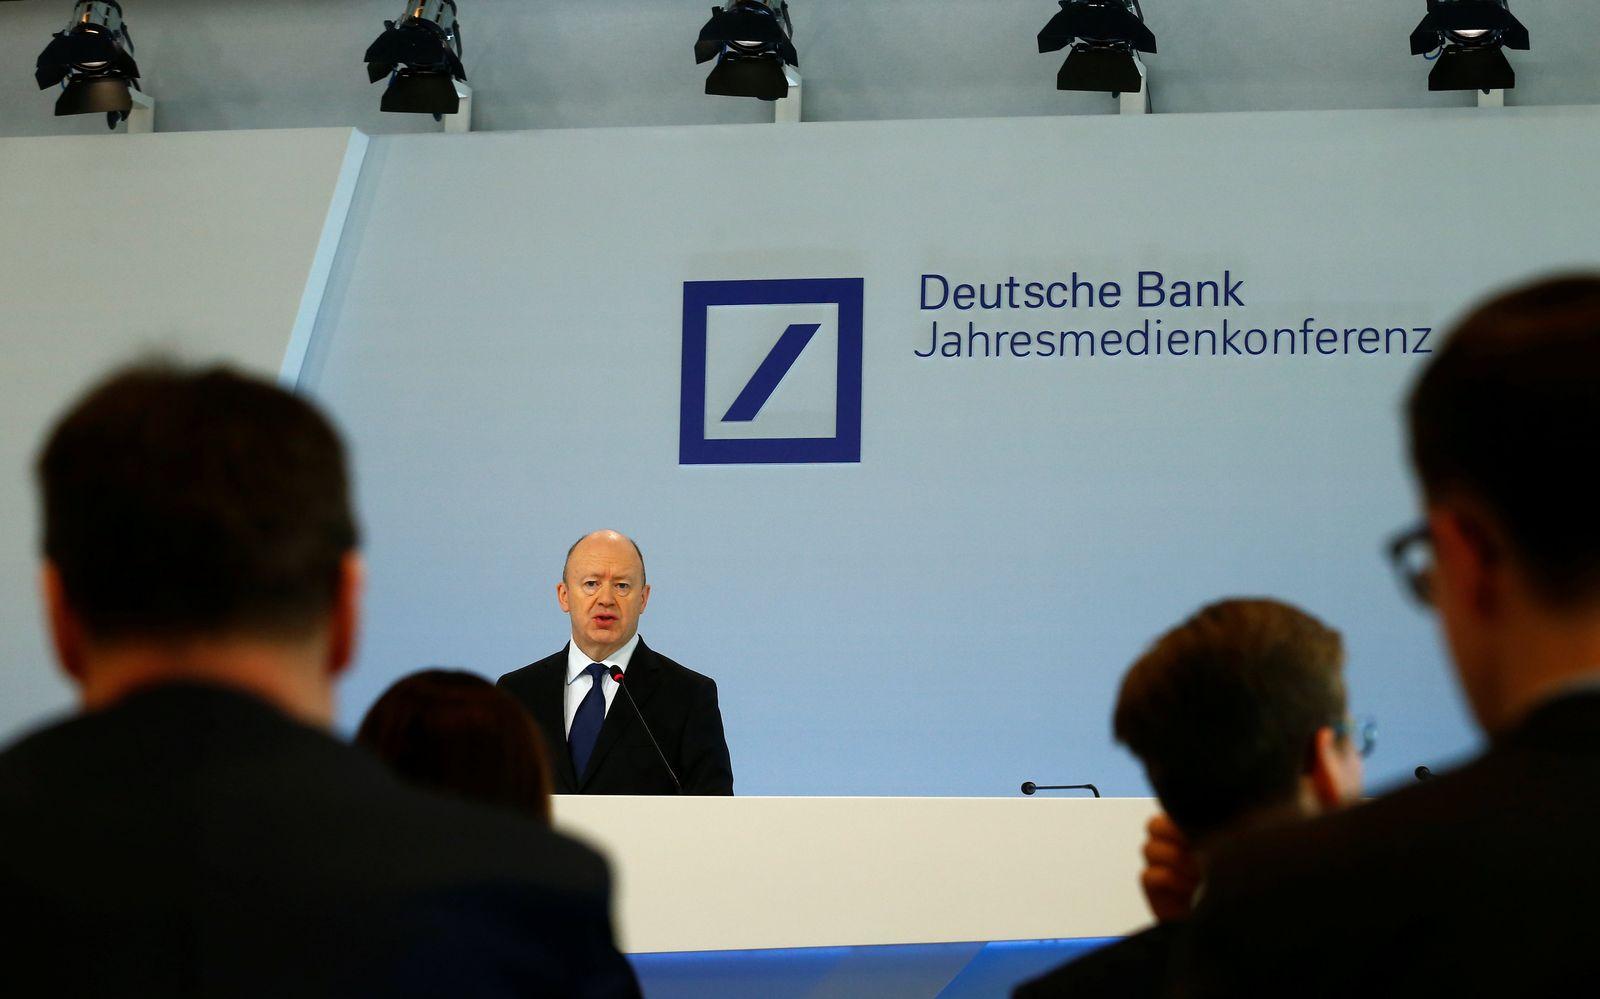 Deutsche Bank / John Cryan